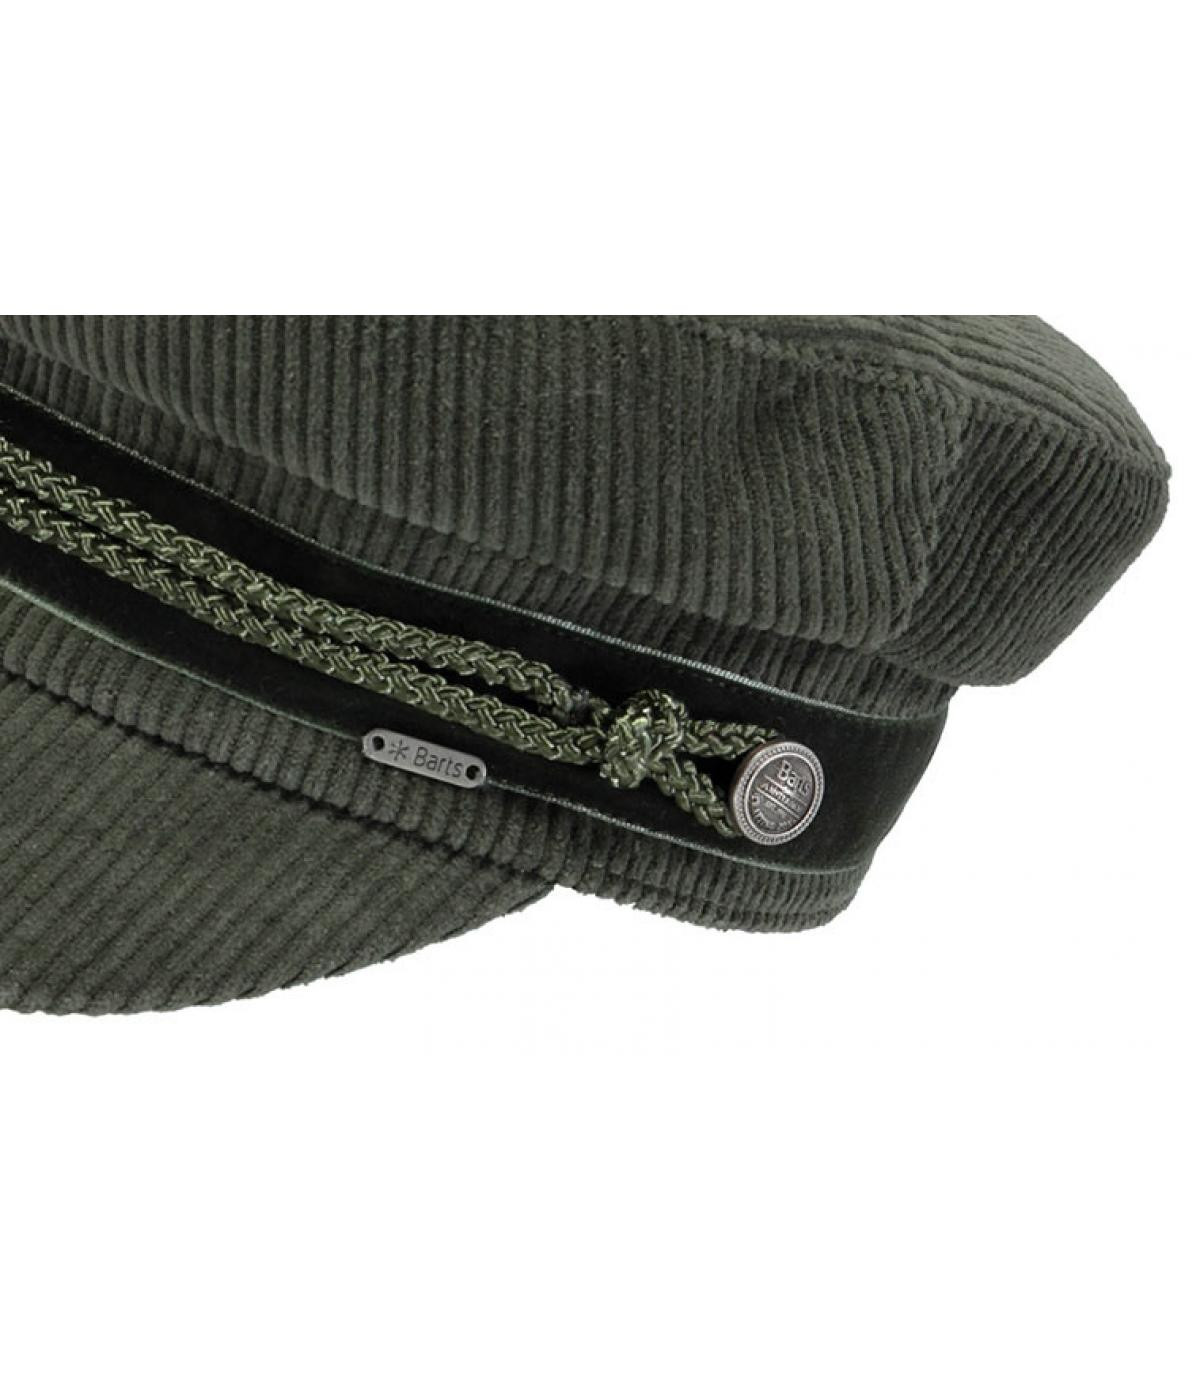 Sailor cap khaki Barts - Odessa Cap army by Barts. Headict b1672883df64